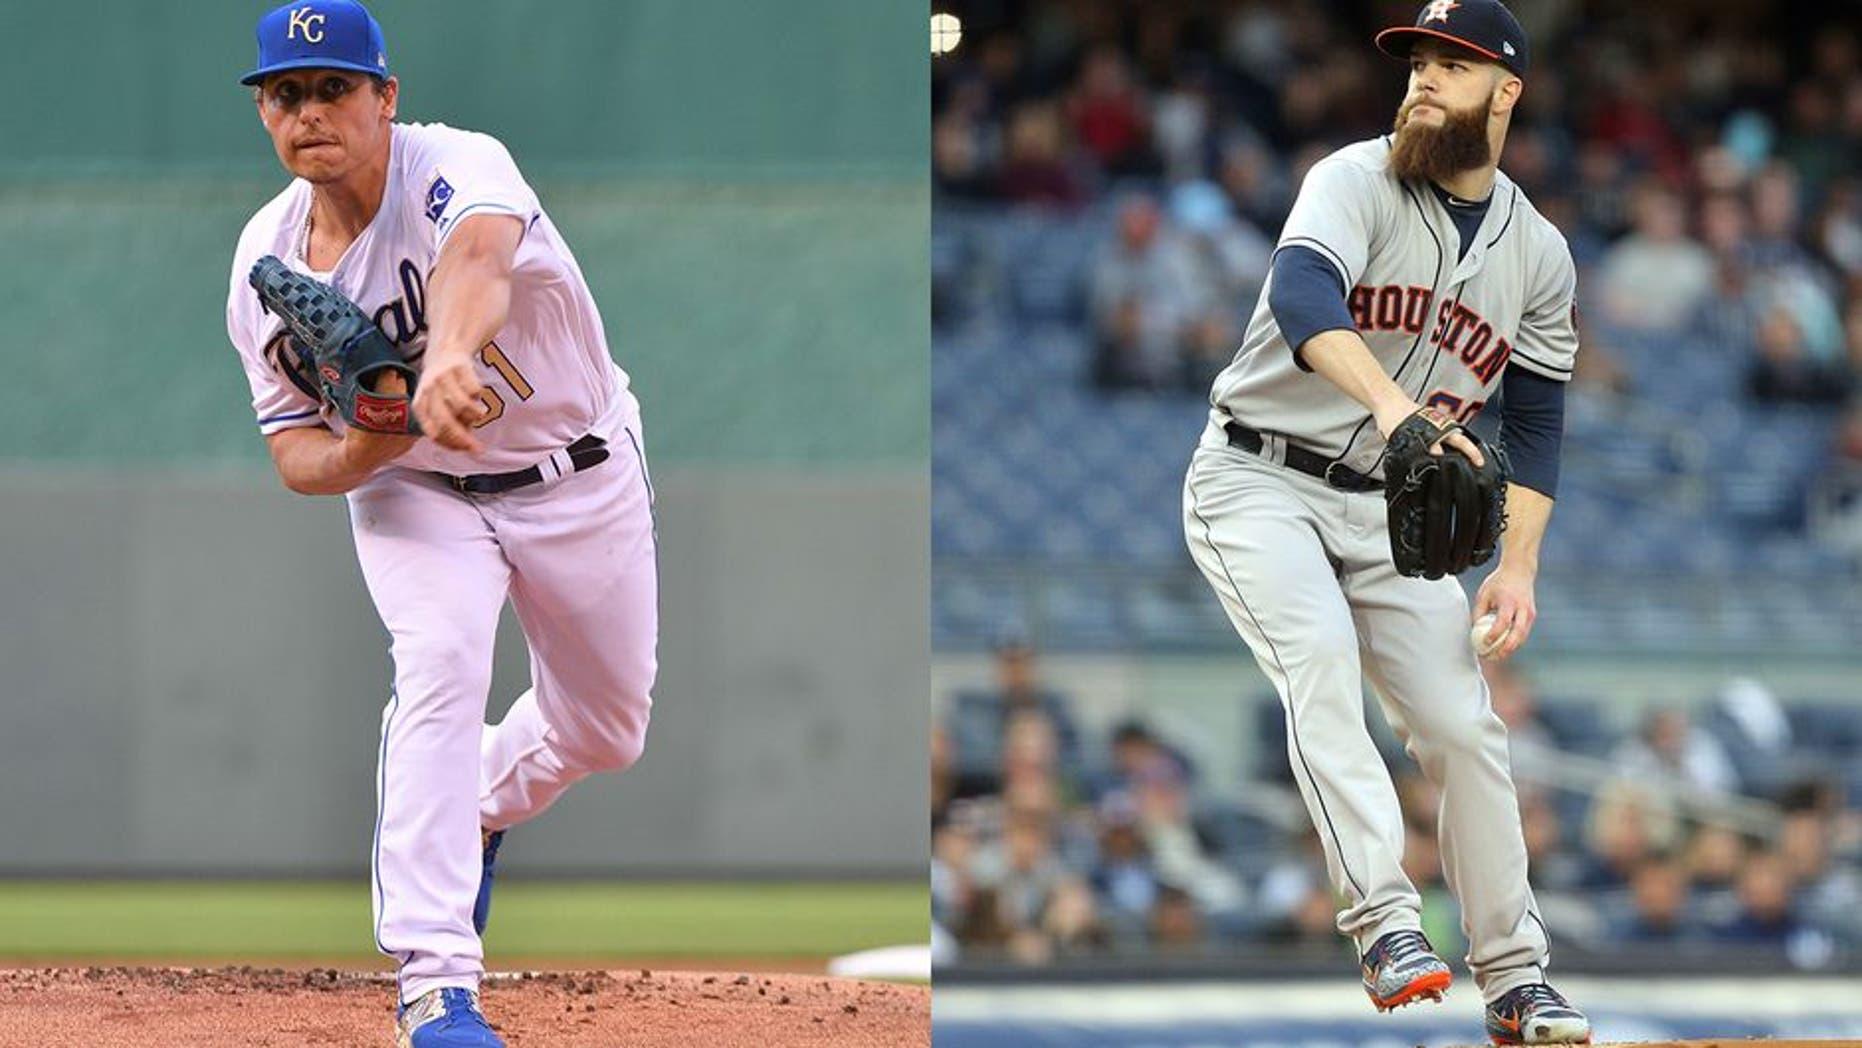 Royals pitcher Jason Vargas and Astros pitcher Dallas Keuchel